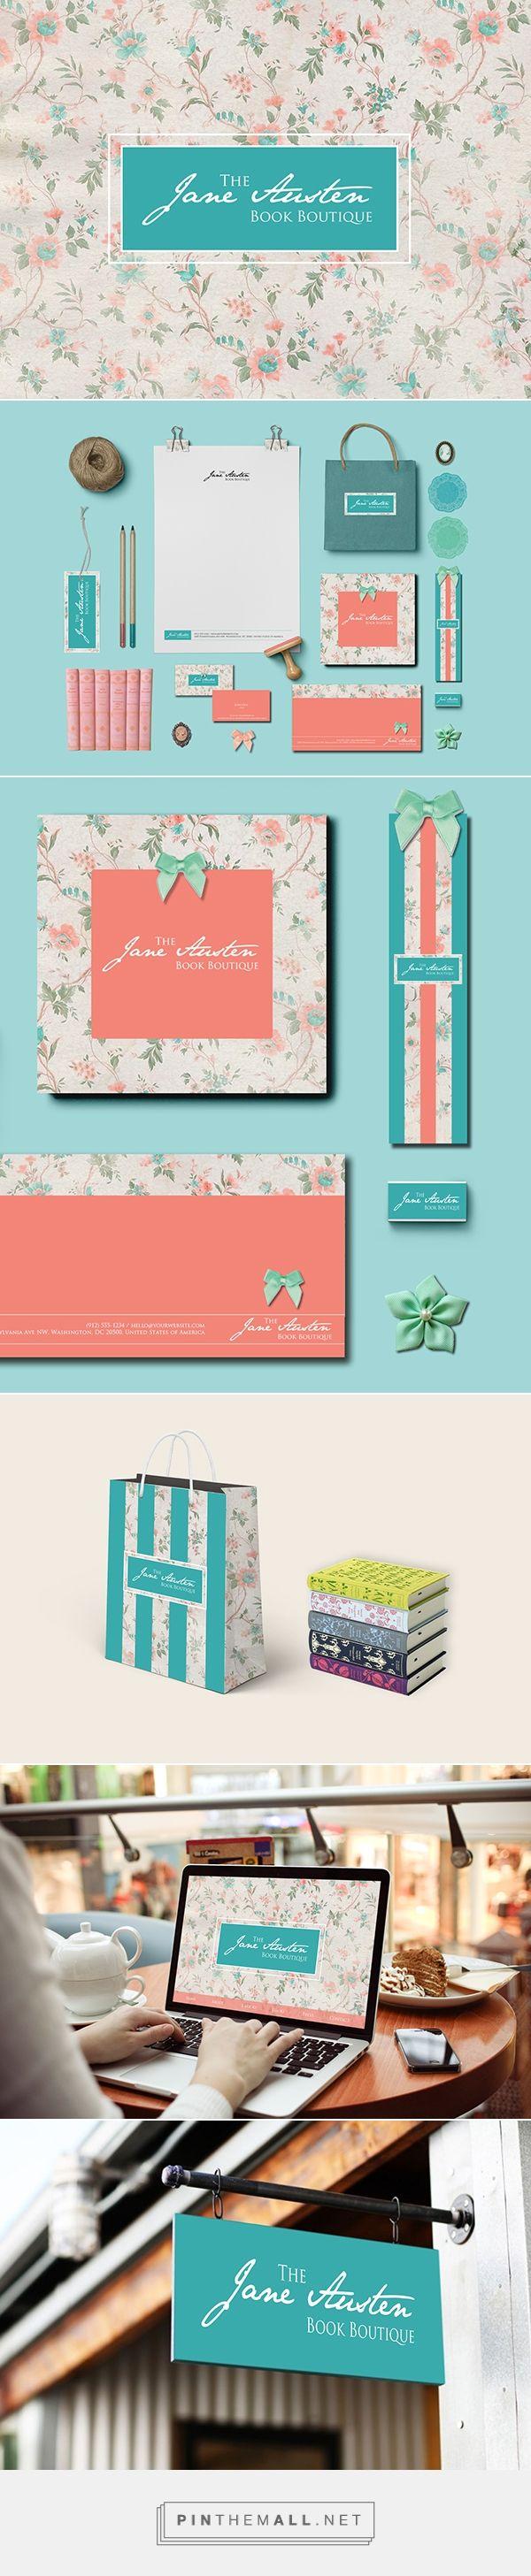 The Jane Austen Book Boutique on Behance   Fivestar Branding – Design and Branding Agency & Inspiration Gallery